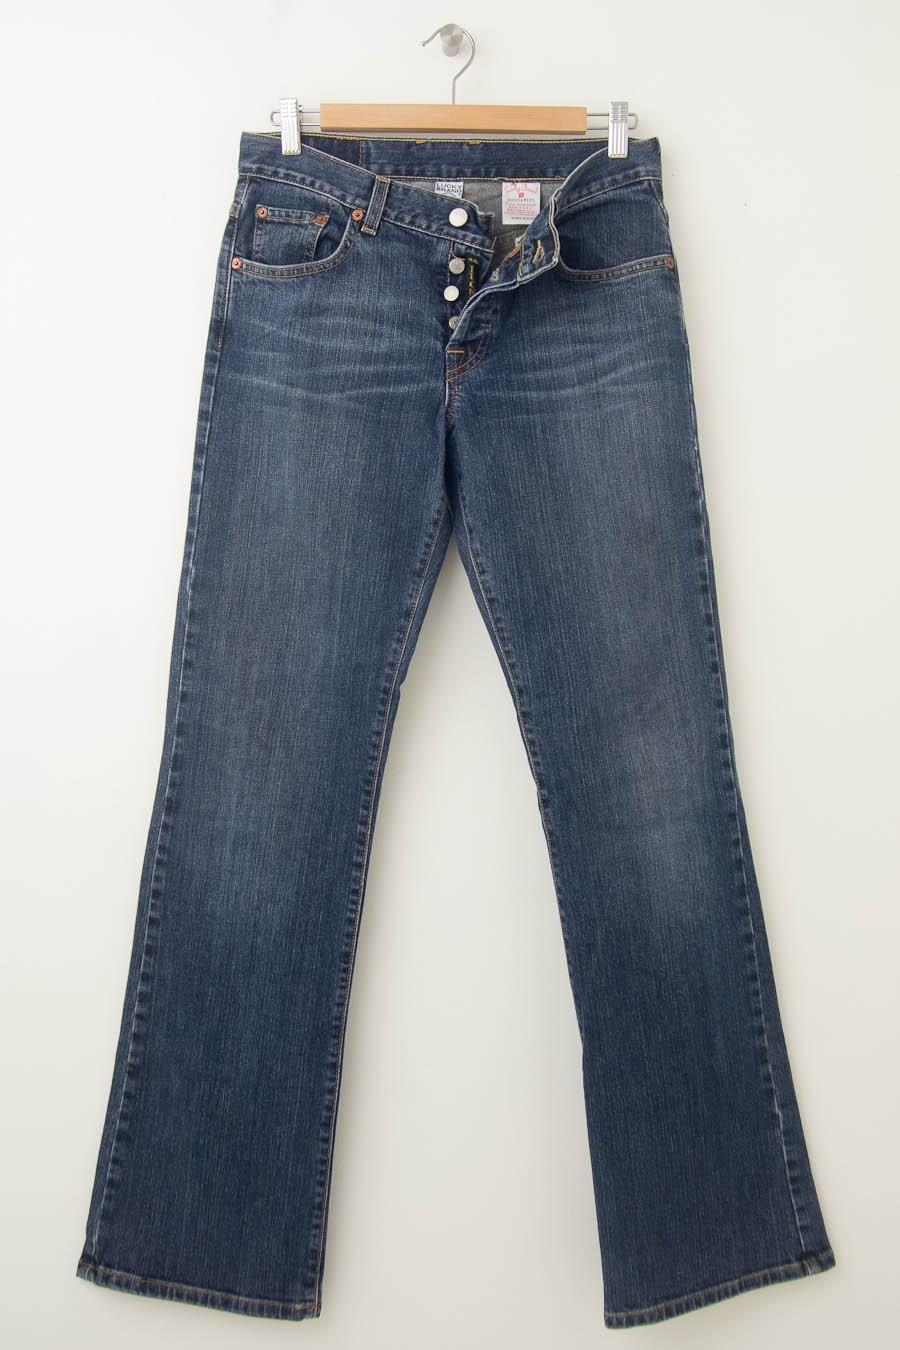 Lucky Brand Easy Rider Jeans Women S 6 28